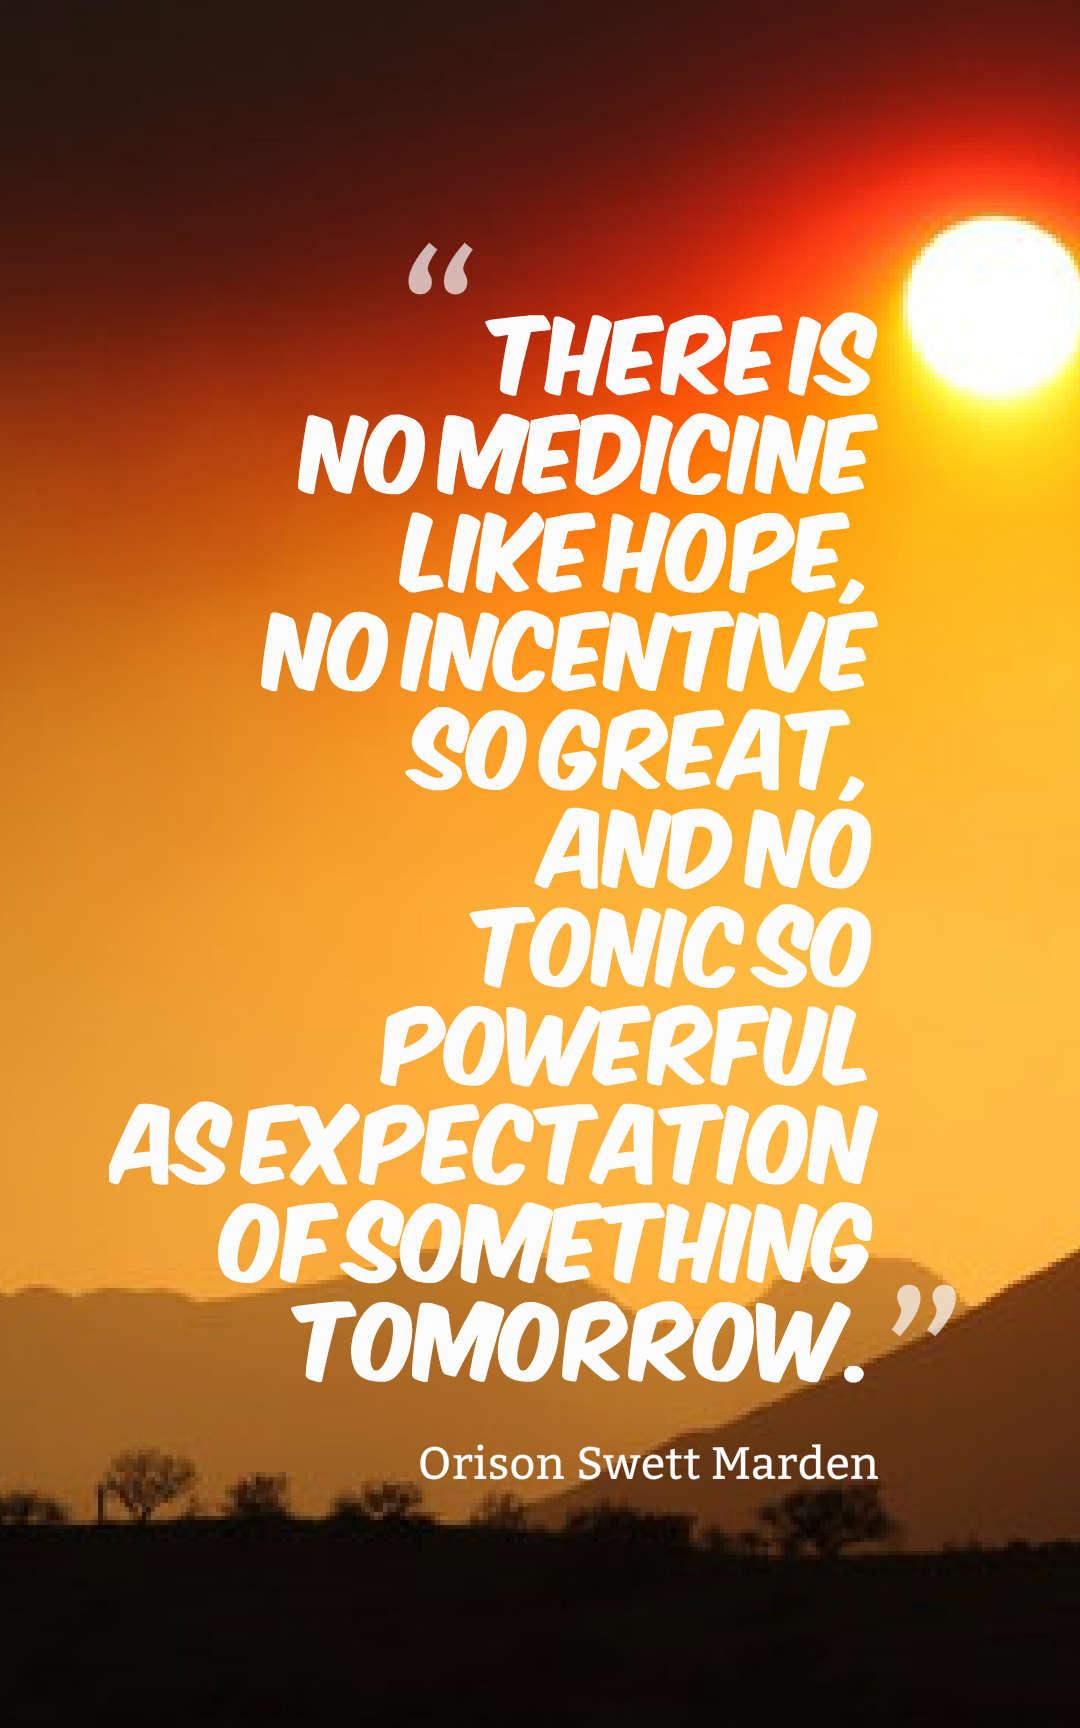 There is no medicine like hope - Orison Swett Marden